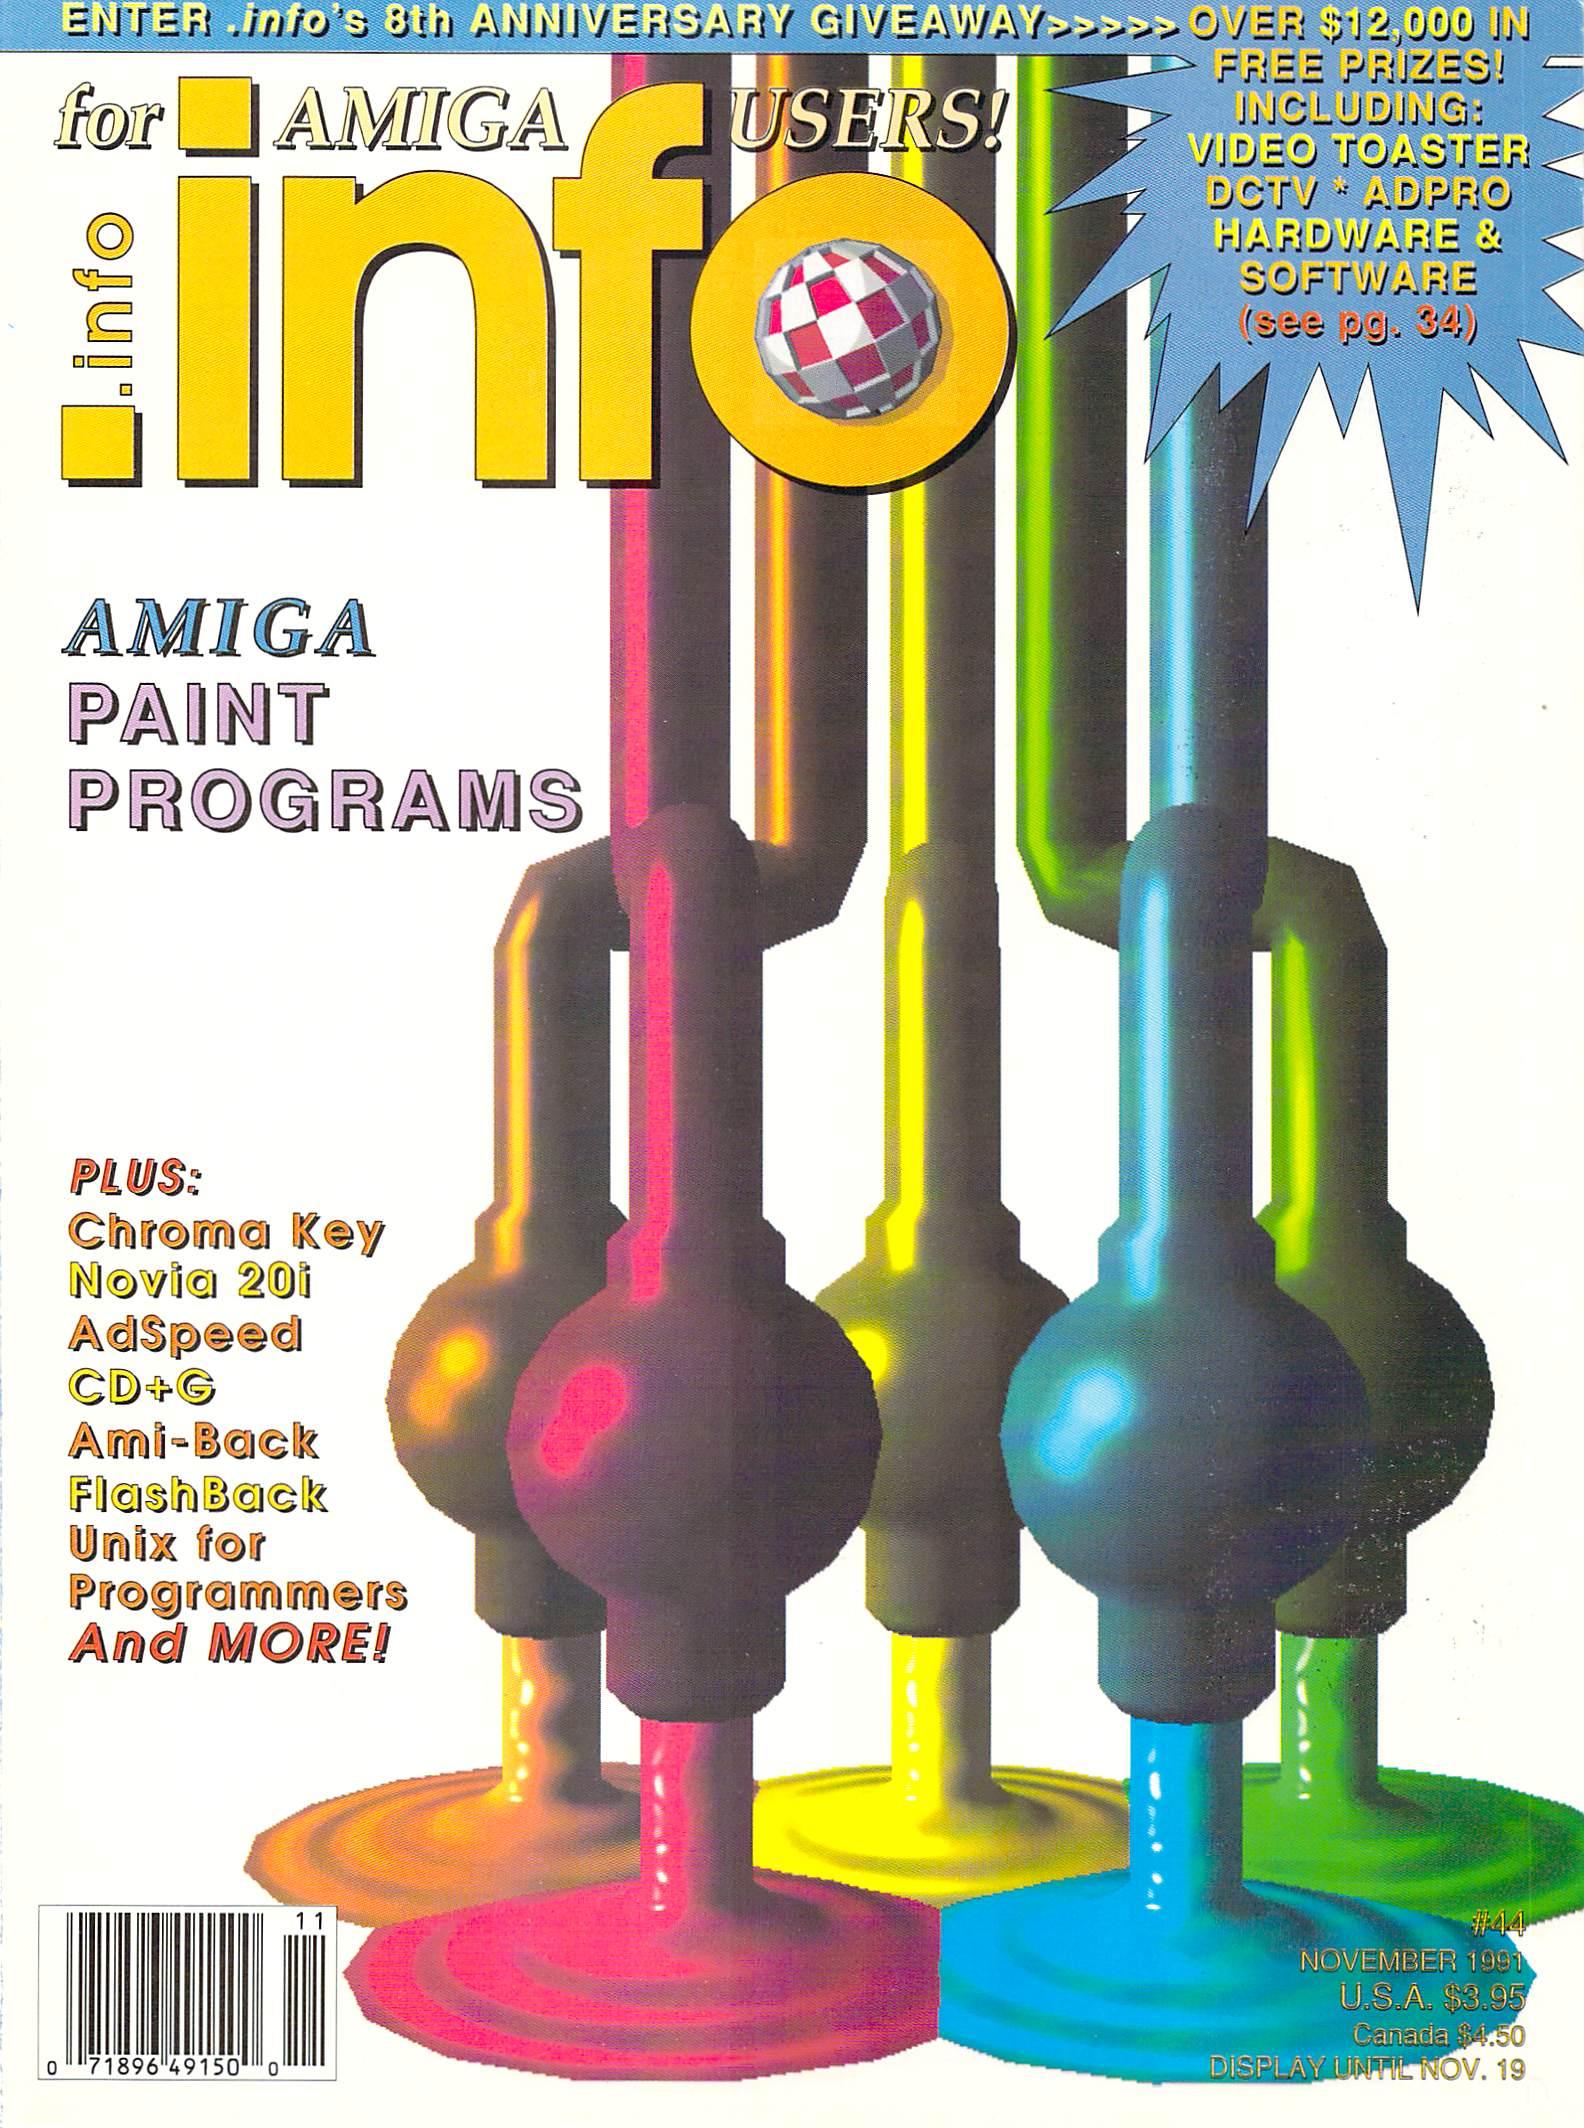 info_issue_44_1991_nov-01